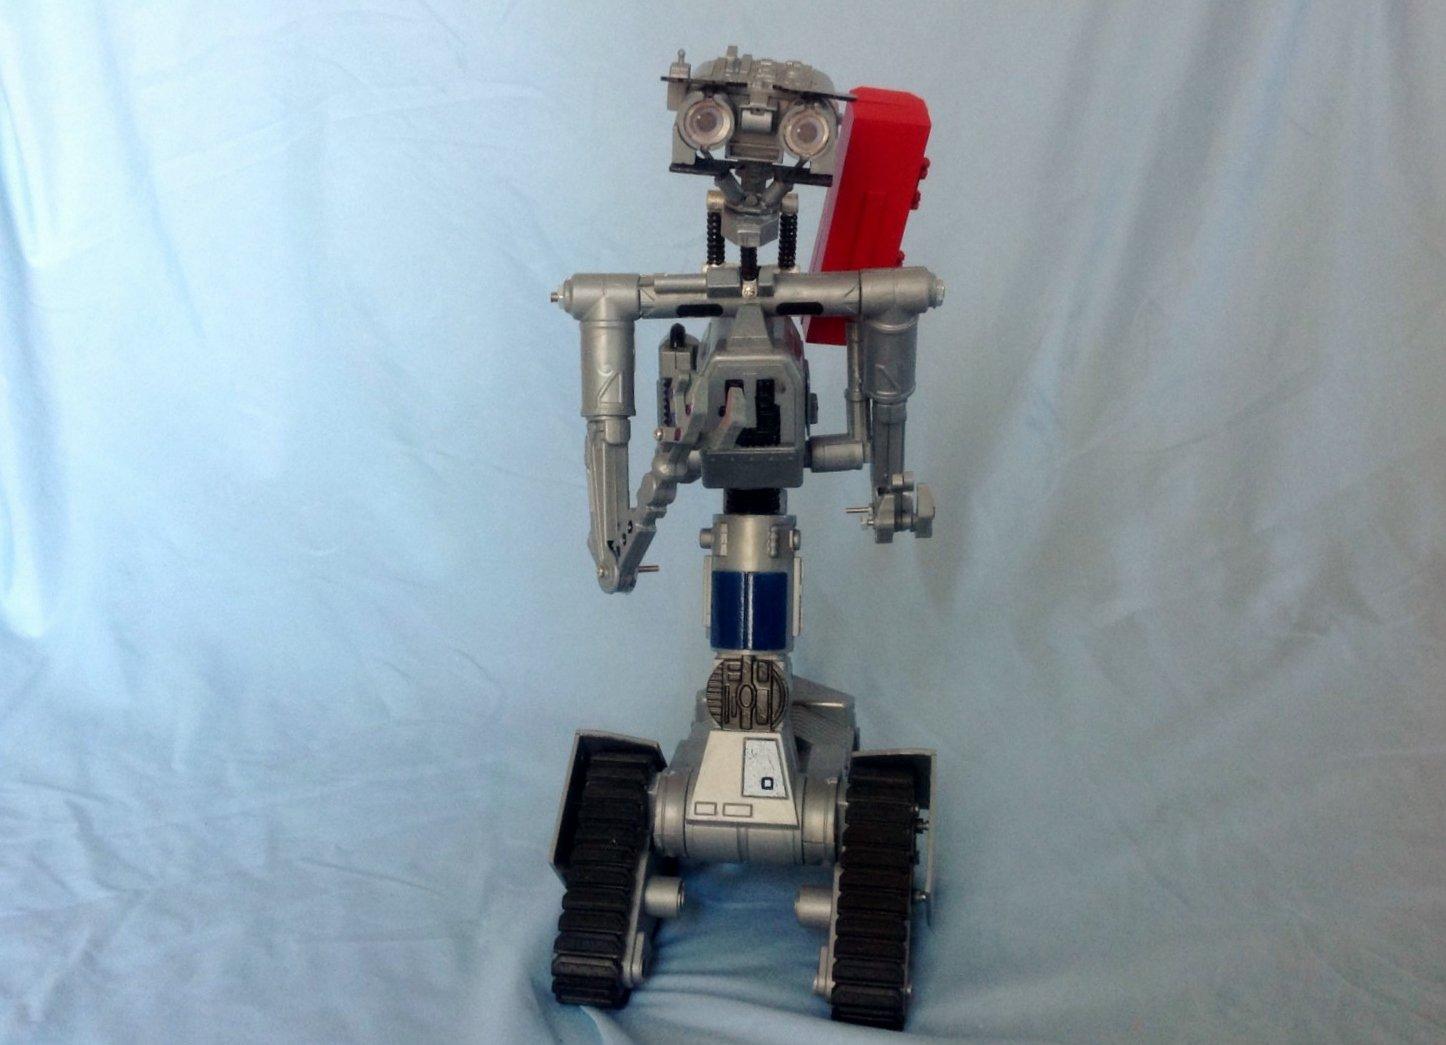 Johnny 5 Short Circuit 2 Toy Robot Replica Movie Prop